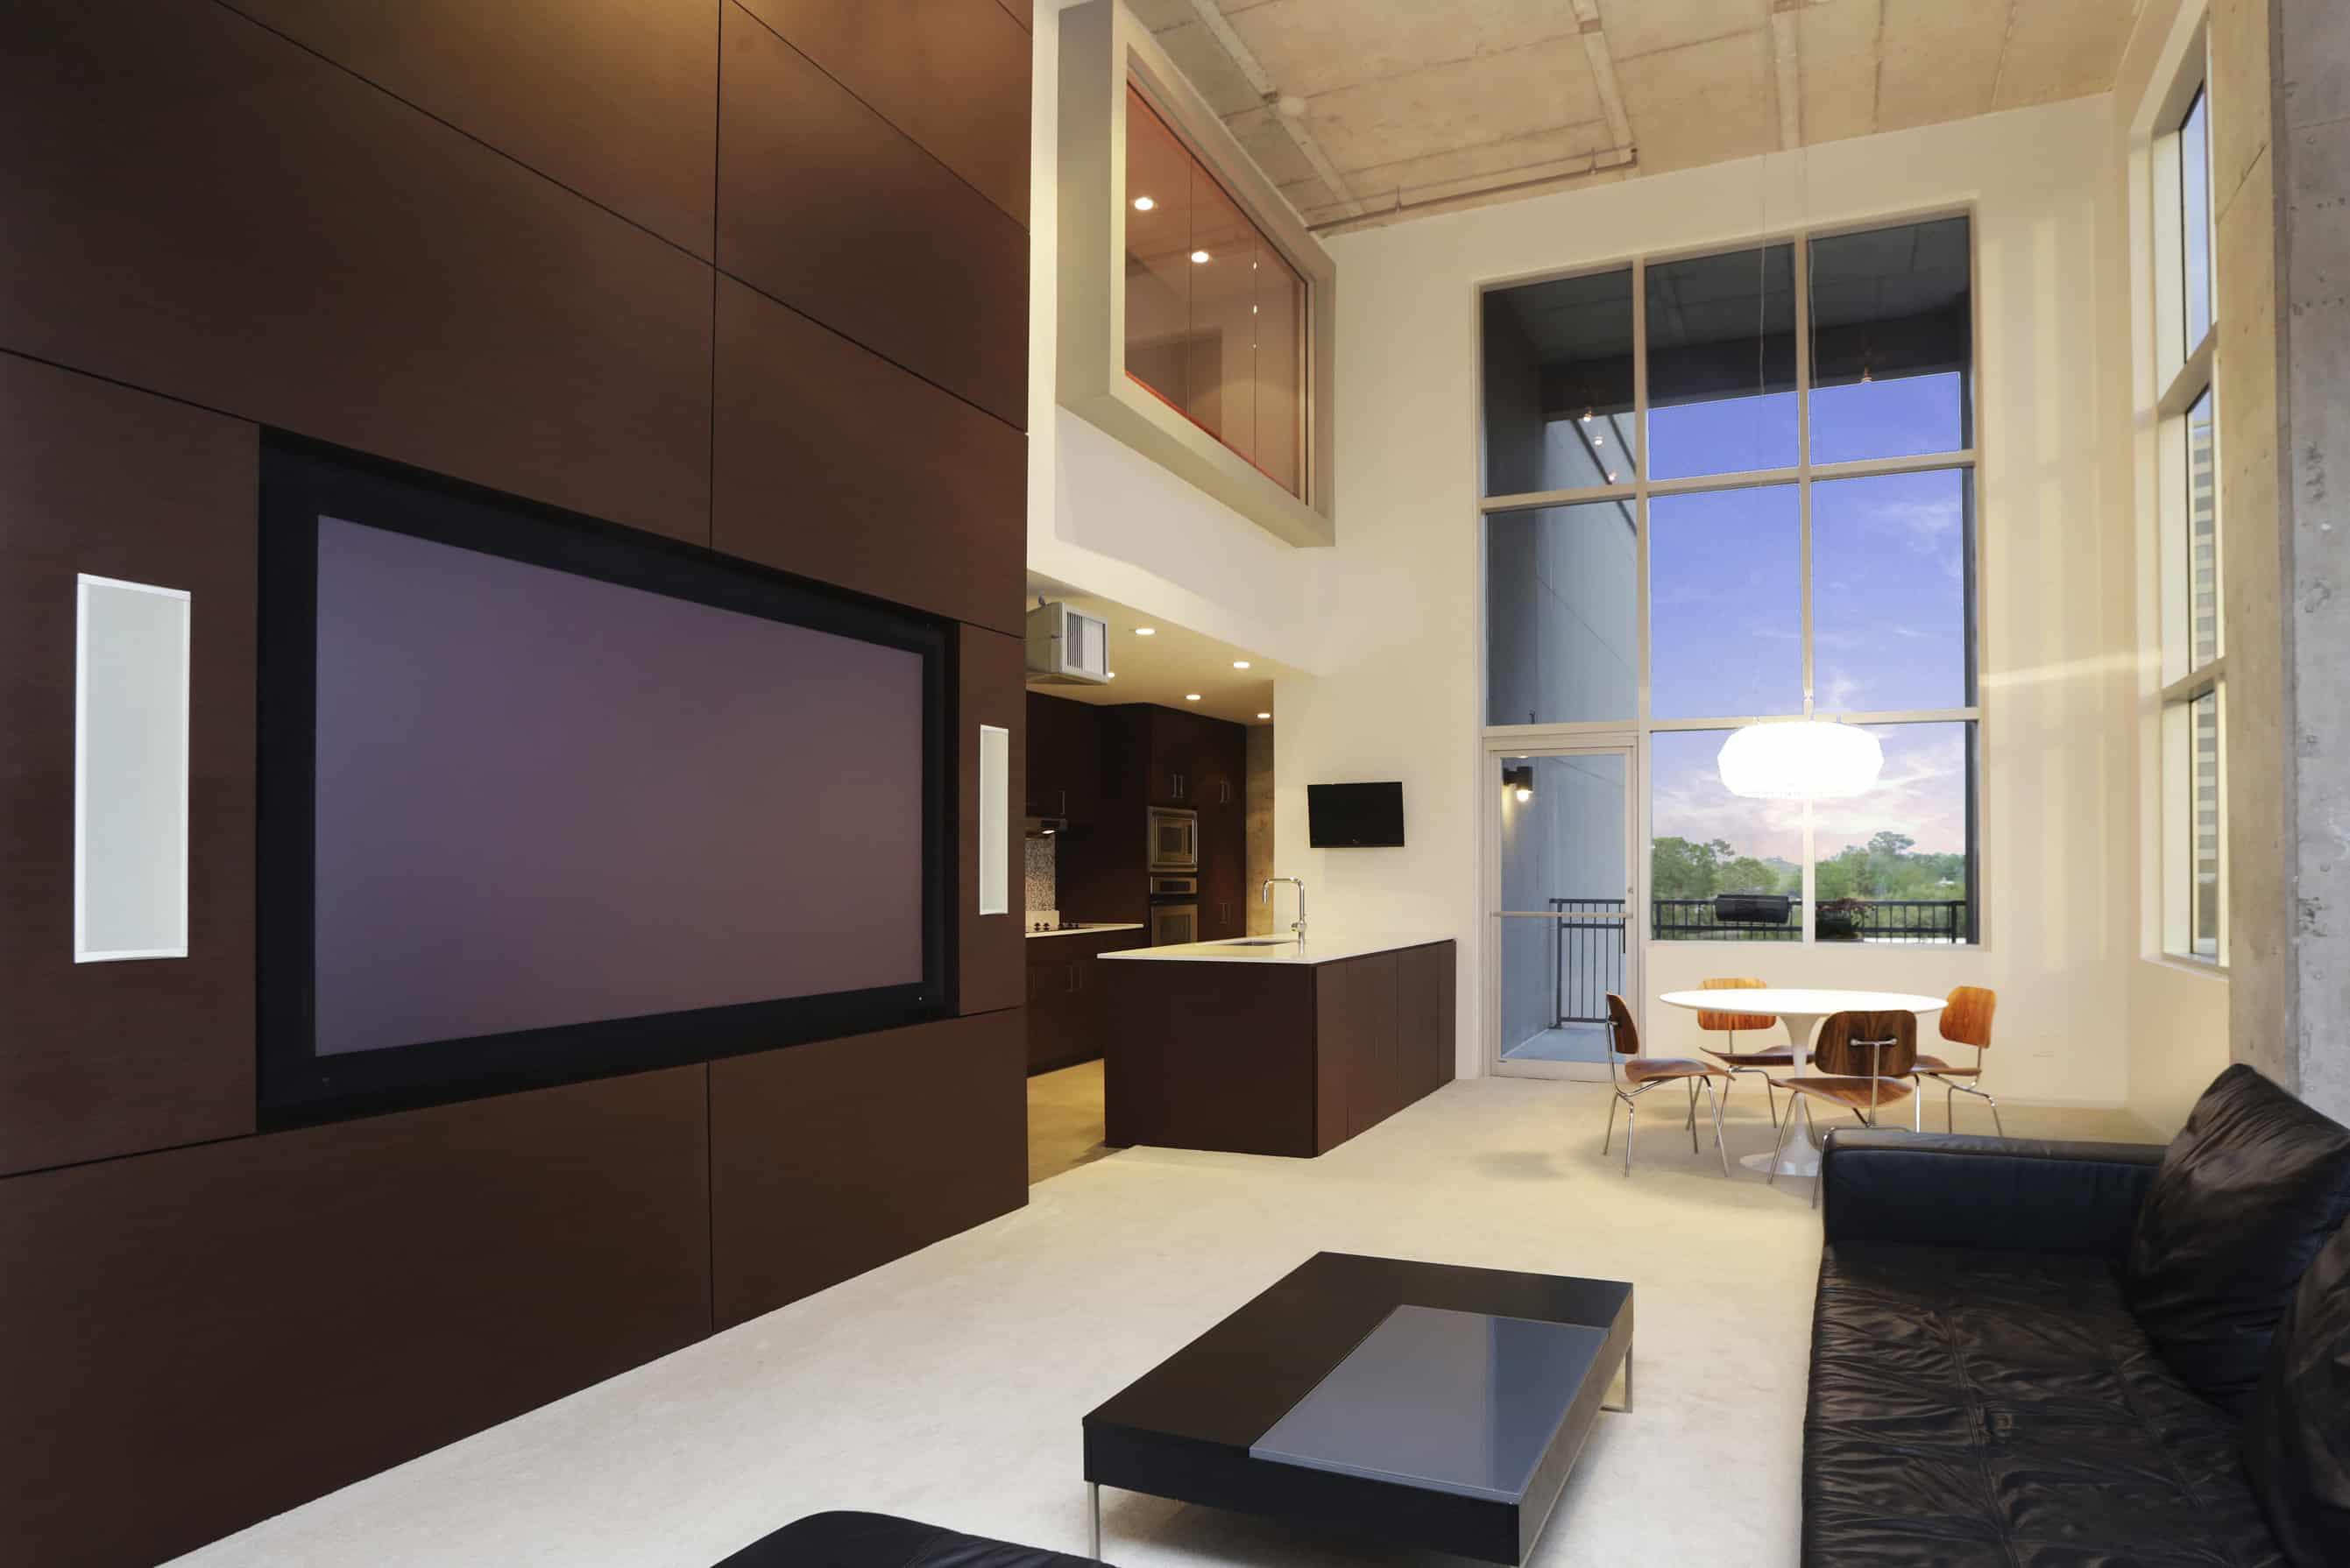 Memorial Luxury Loft bedroom industrial mid century furnishings walnut wood kitchen with high ceiling